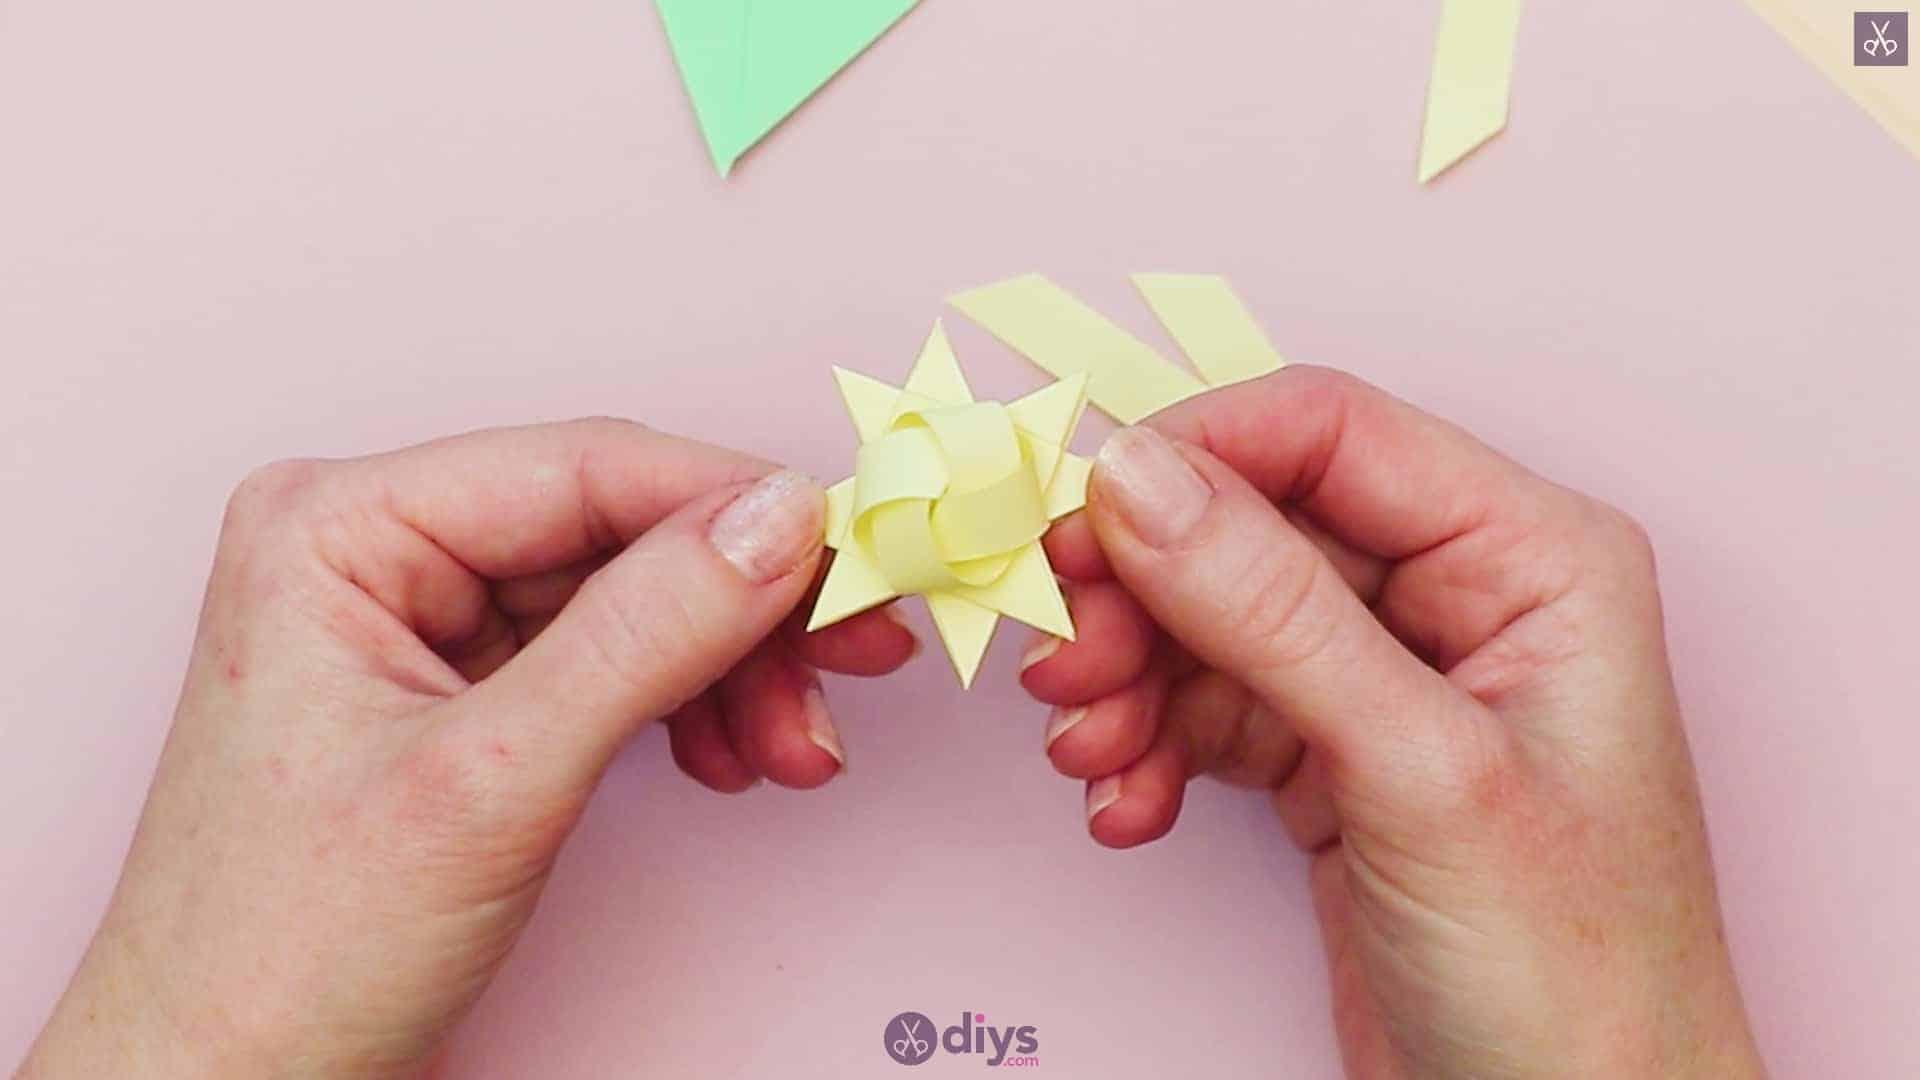 Diy origami flower art step 8b